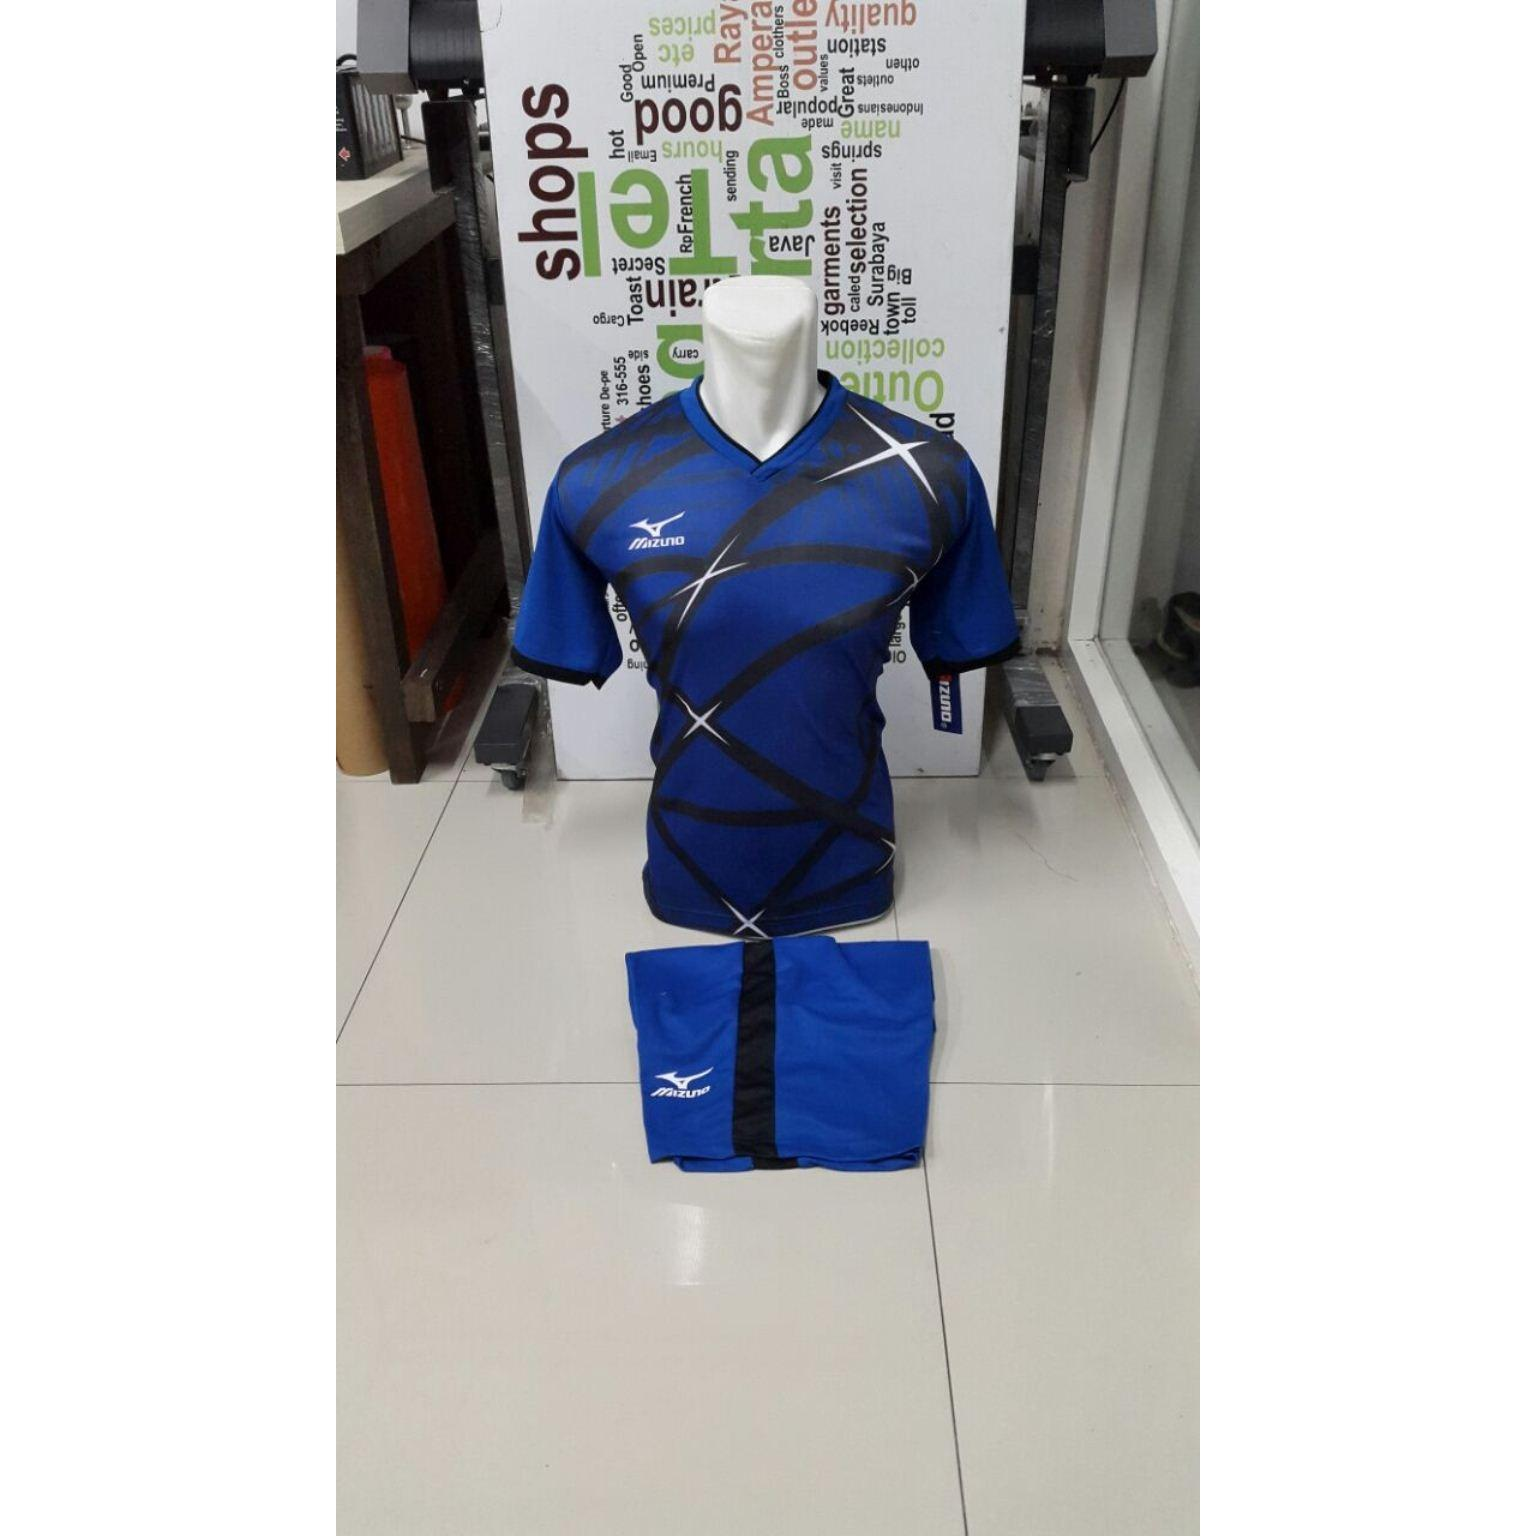 Kostum Kaos Sepakbola Futsal Volly Takraw Bahan Dryfit M L XL Hijau/Merah/Biru/Kuning Hitam Plus Celana Pendek 24.42